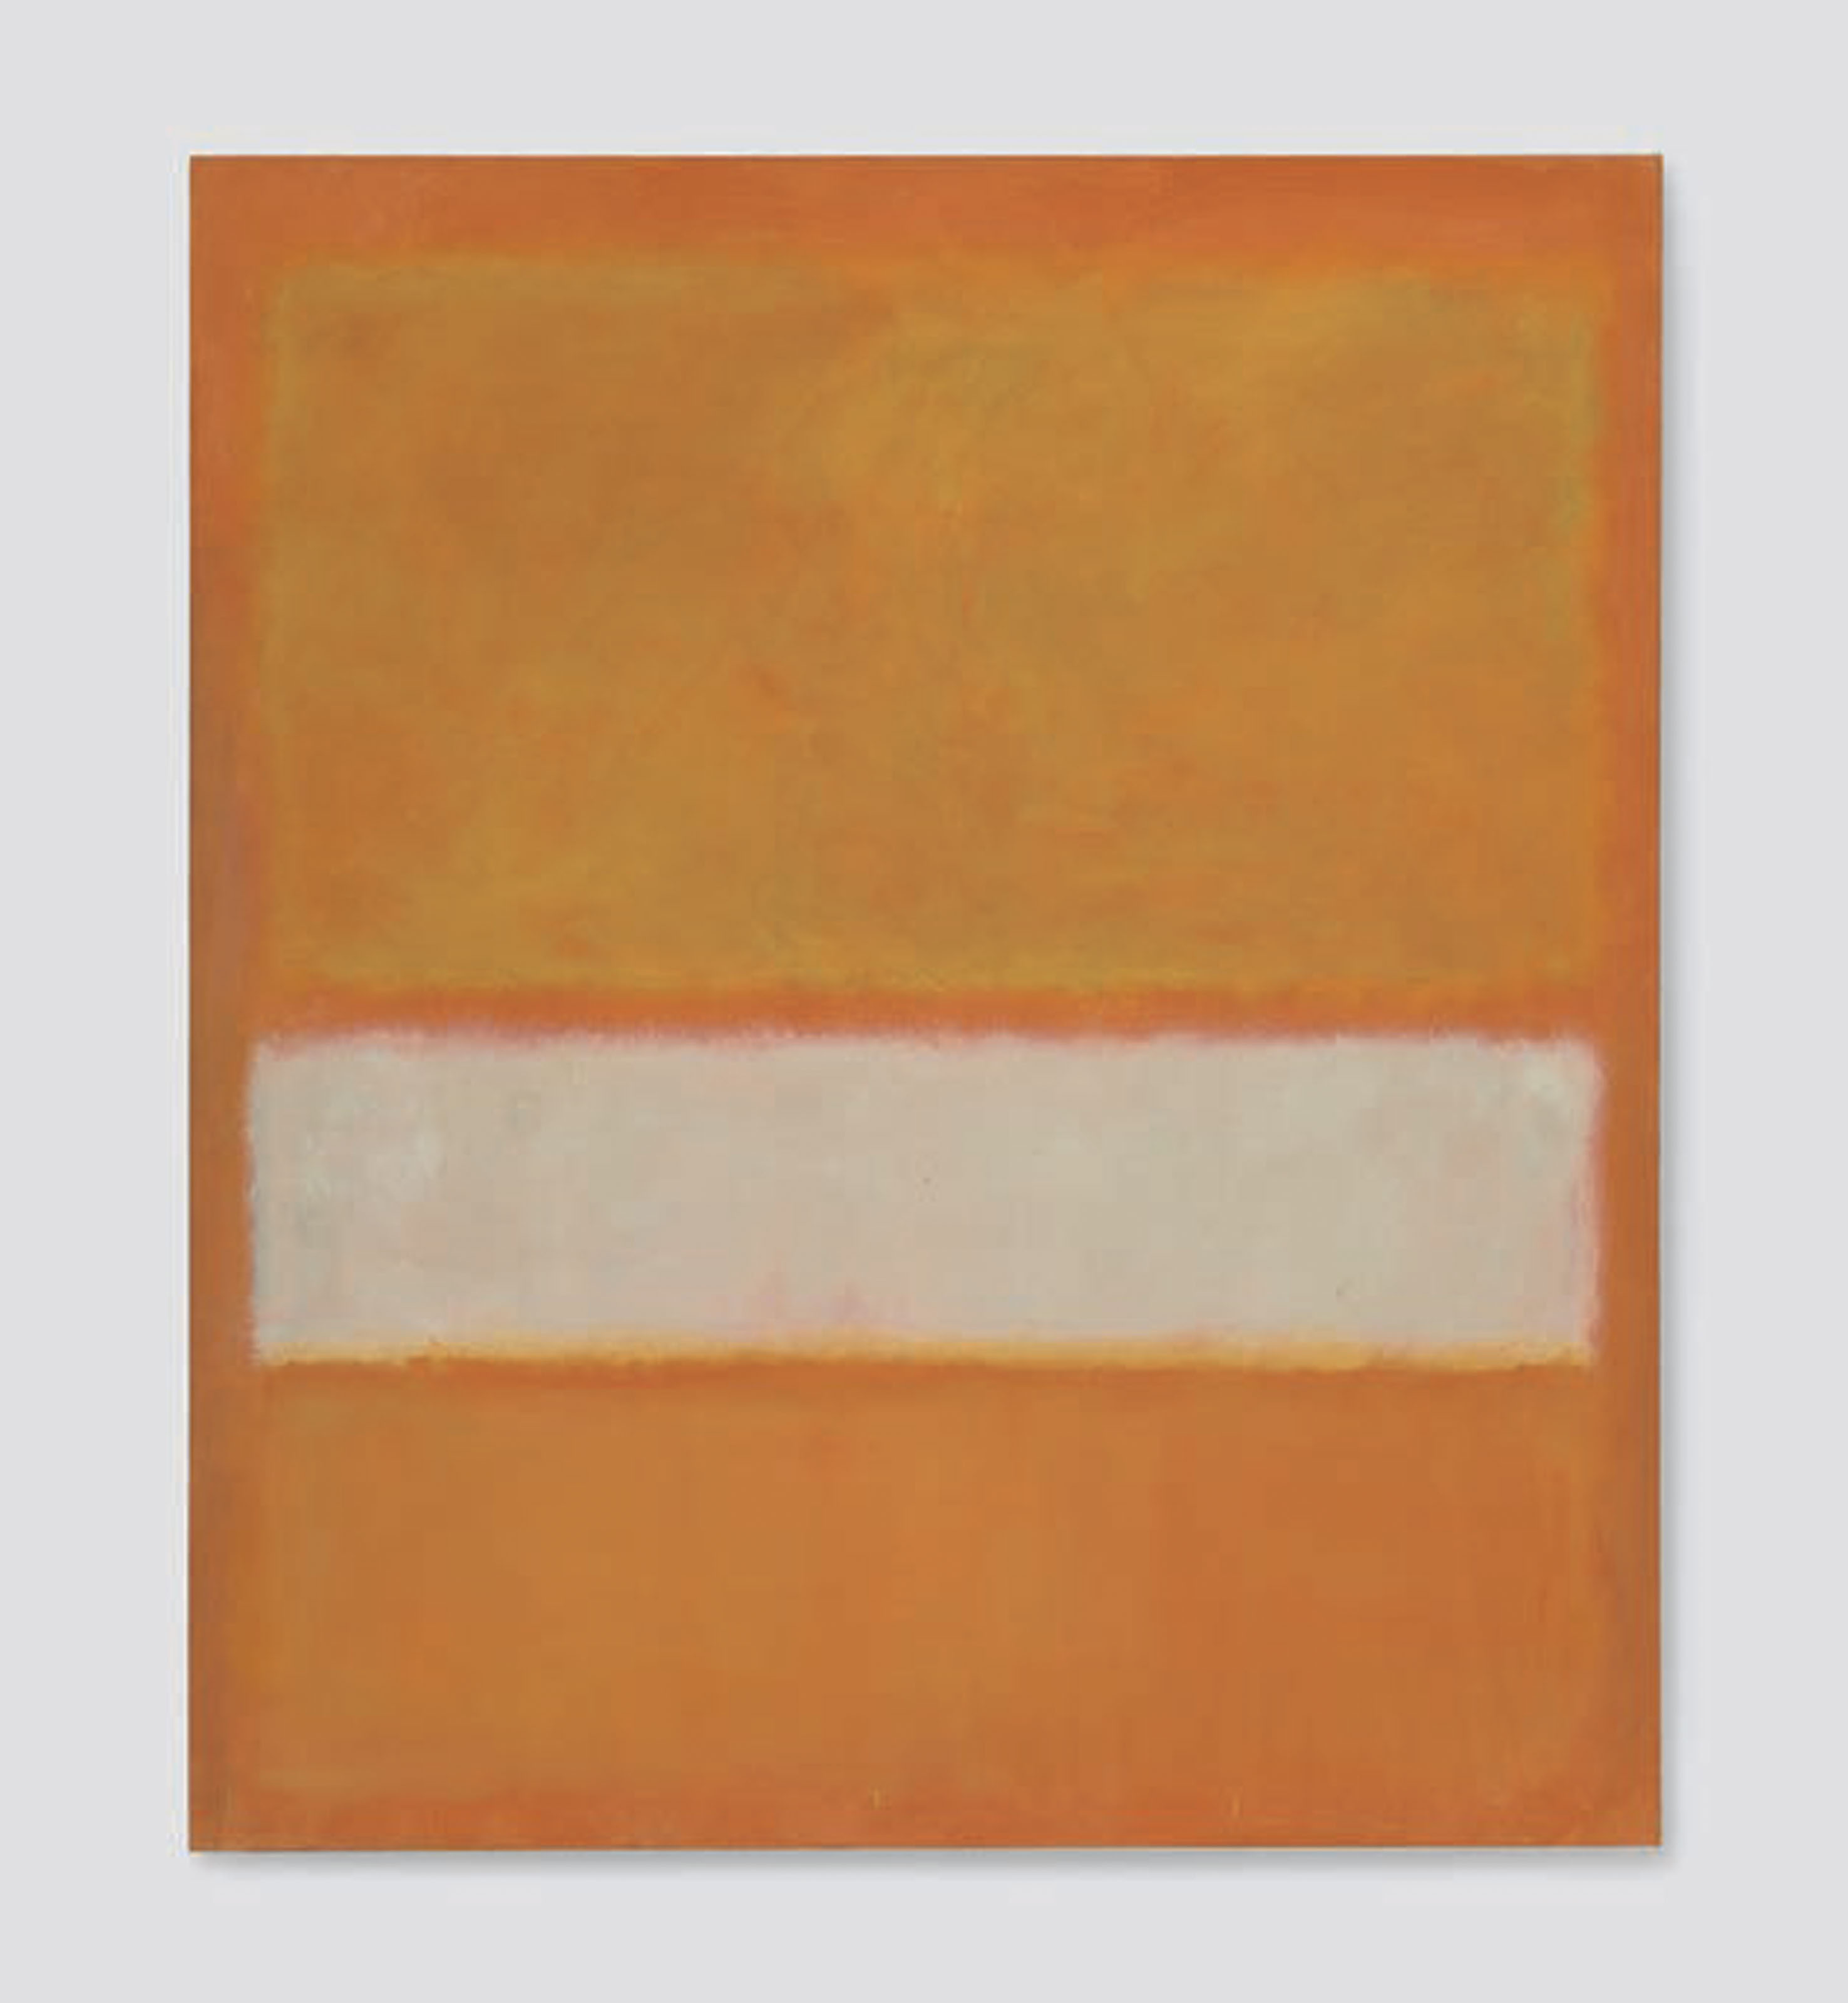 Audio: Mark Rothko, No. 11 (Untitled)